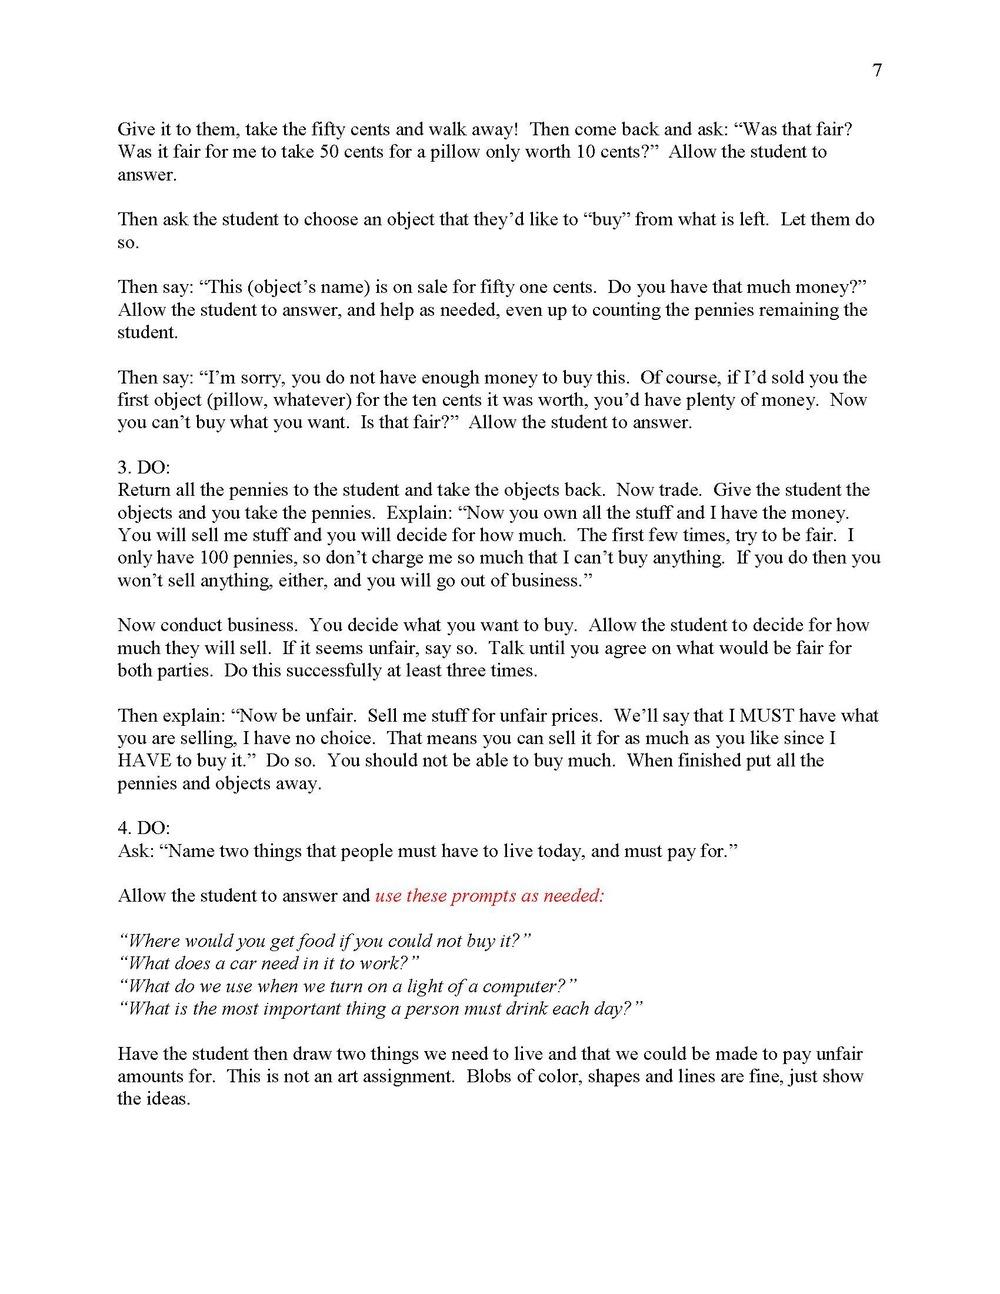 Step 1 Study & Life Skills 7 - What's Fair_Page_08.jpg